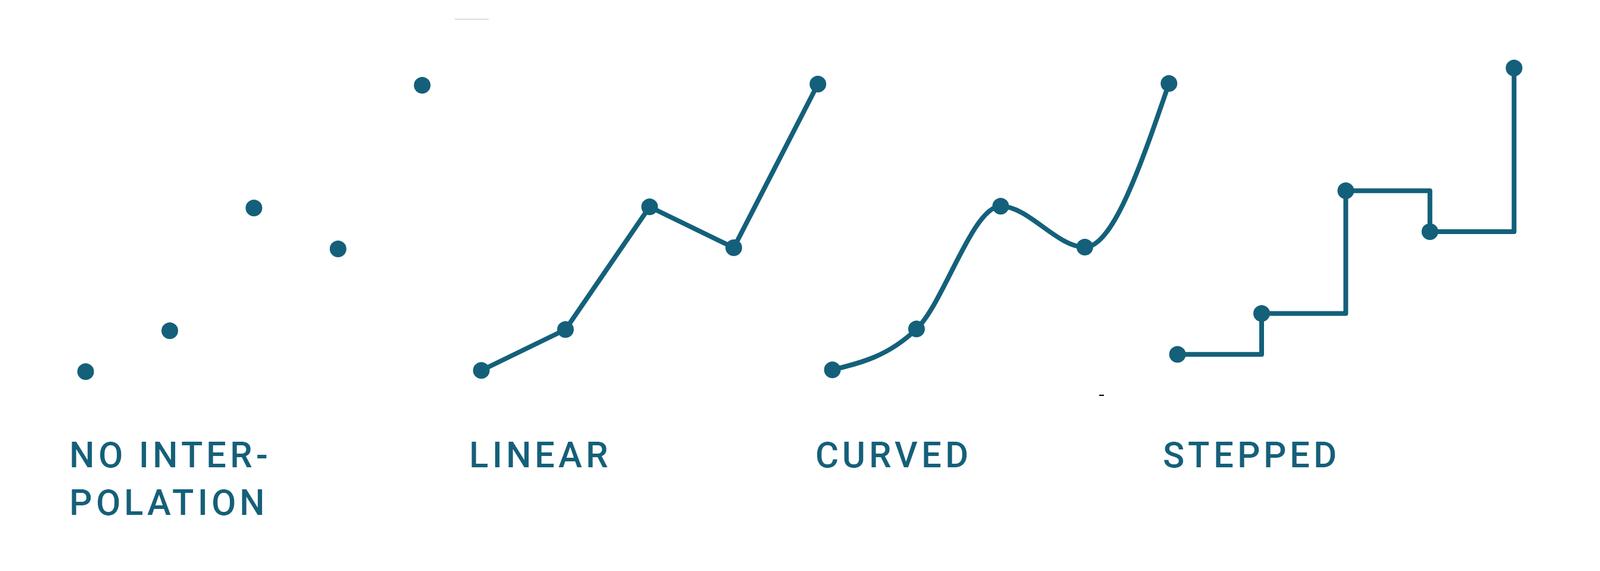 Customizing your line chart - Datawrapper Academy